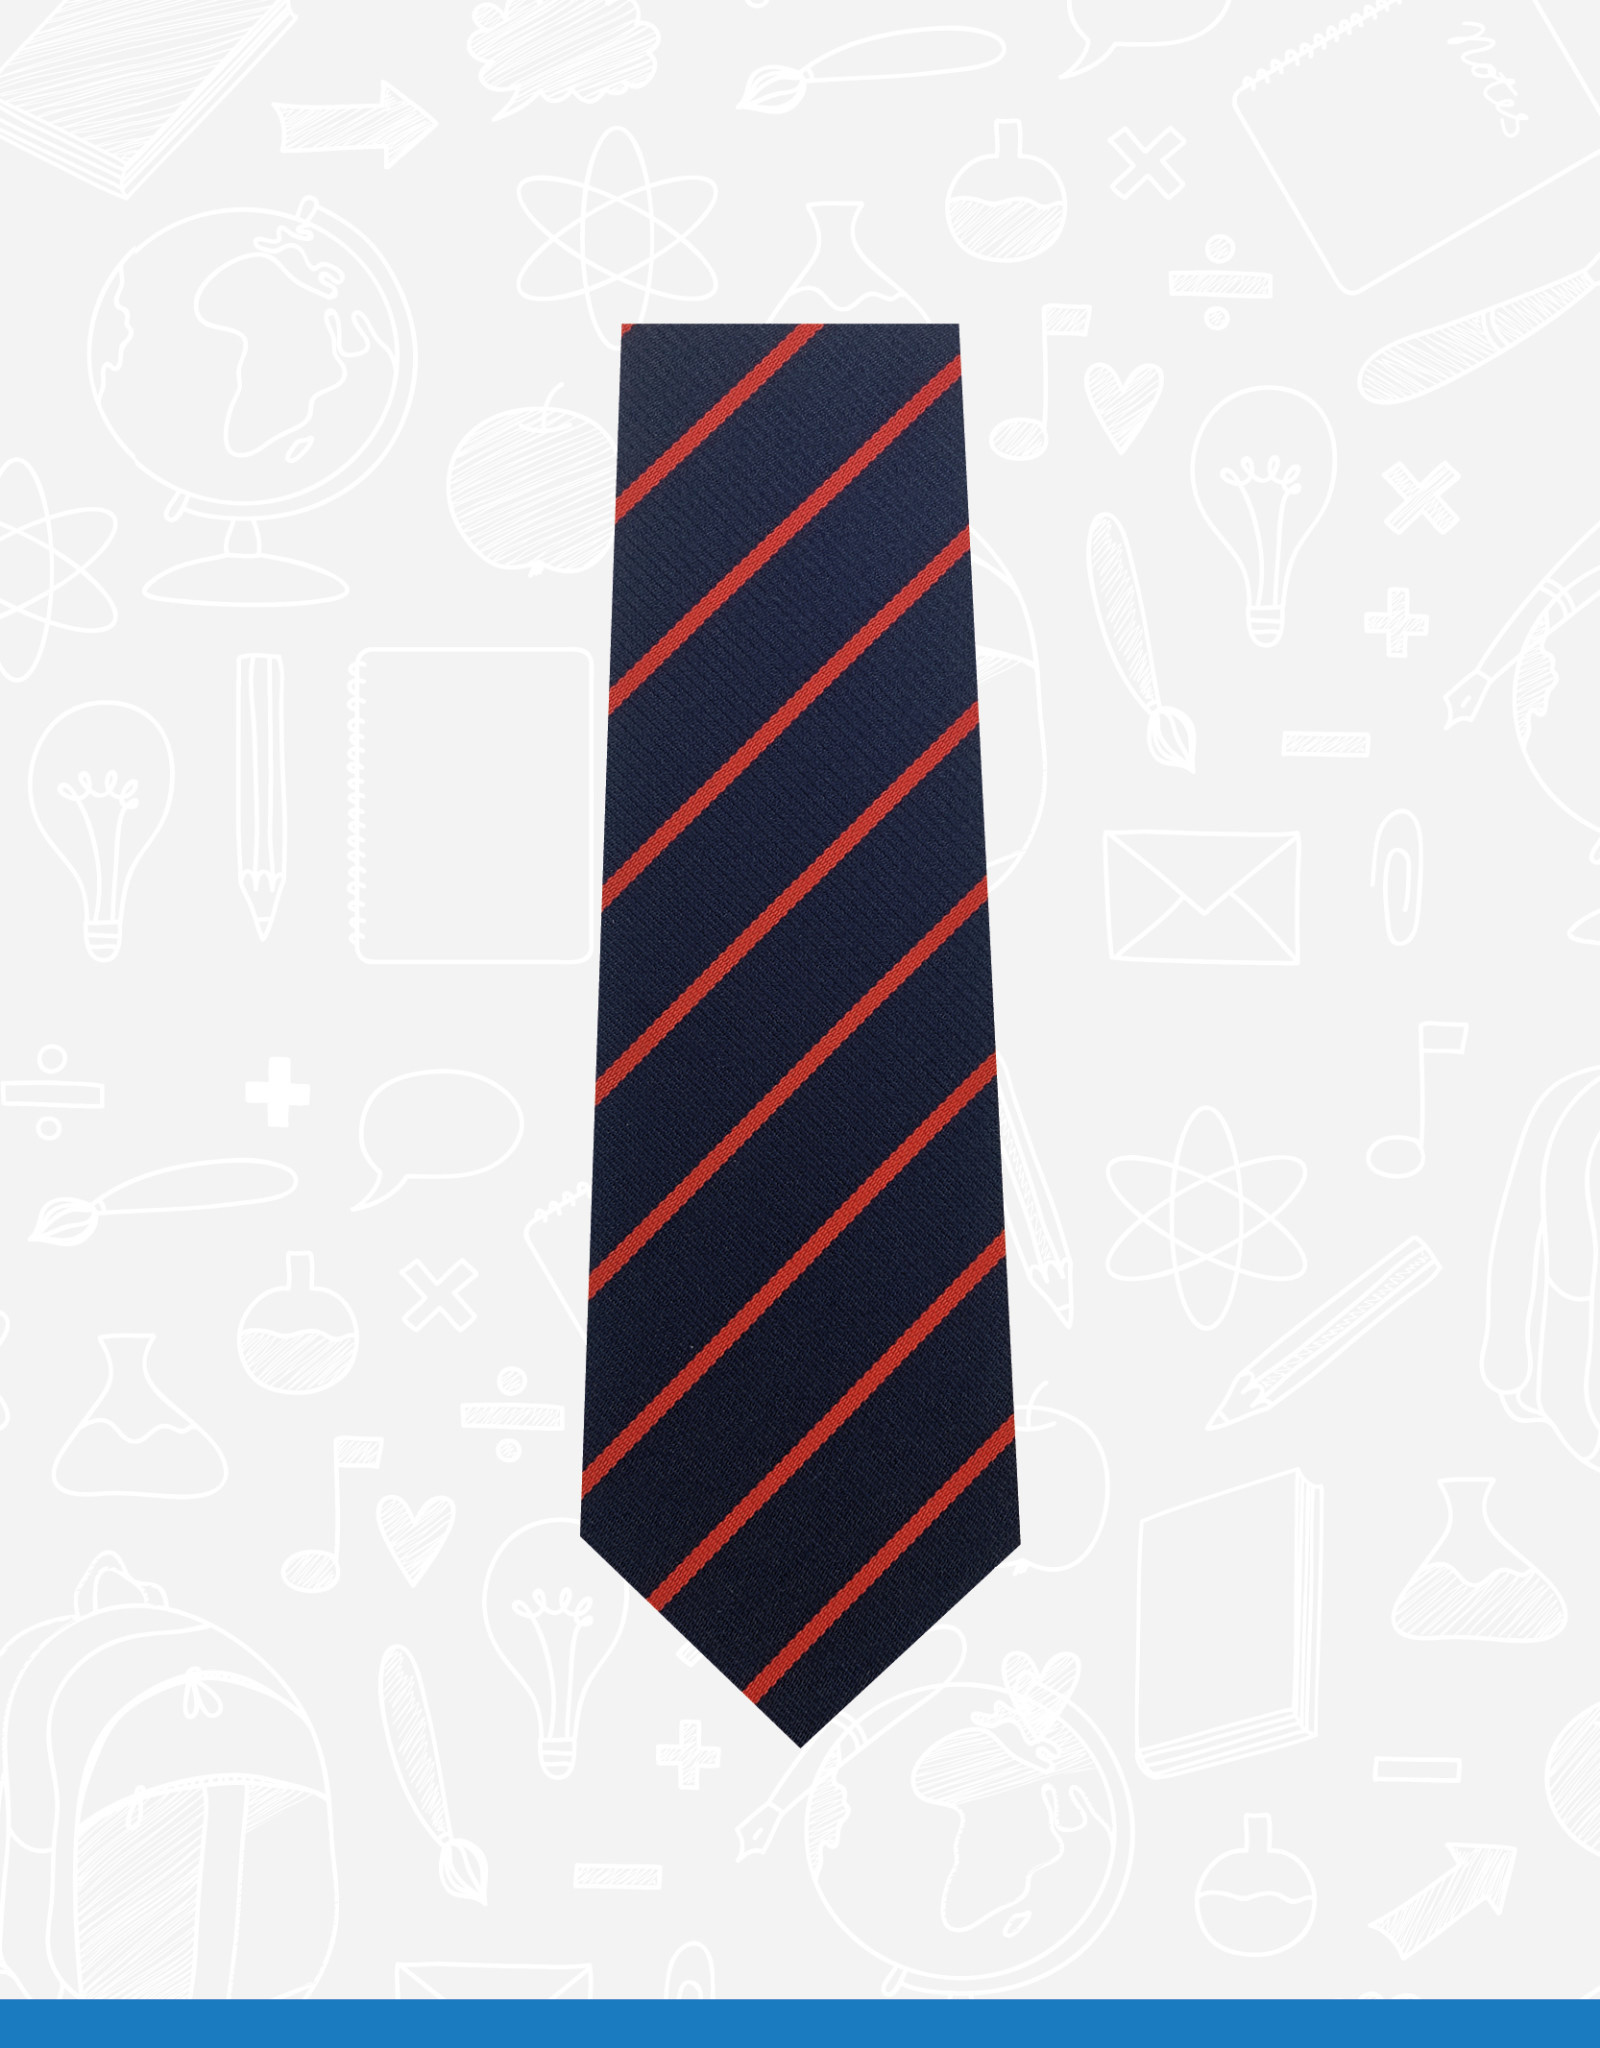 TSW Ties Bangor Academy 6th Form Tie